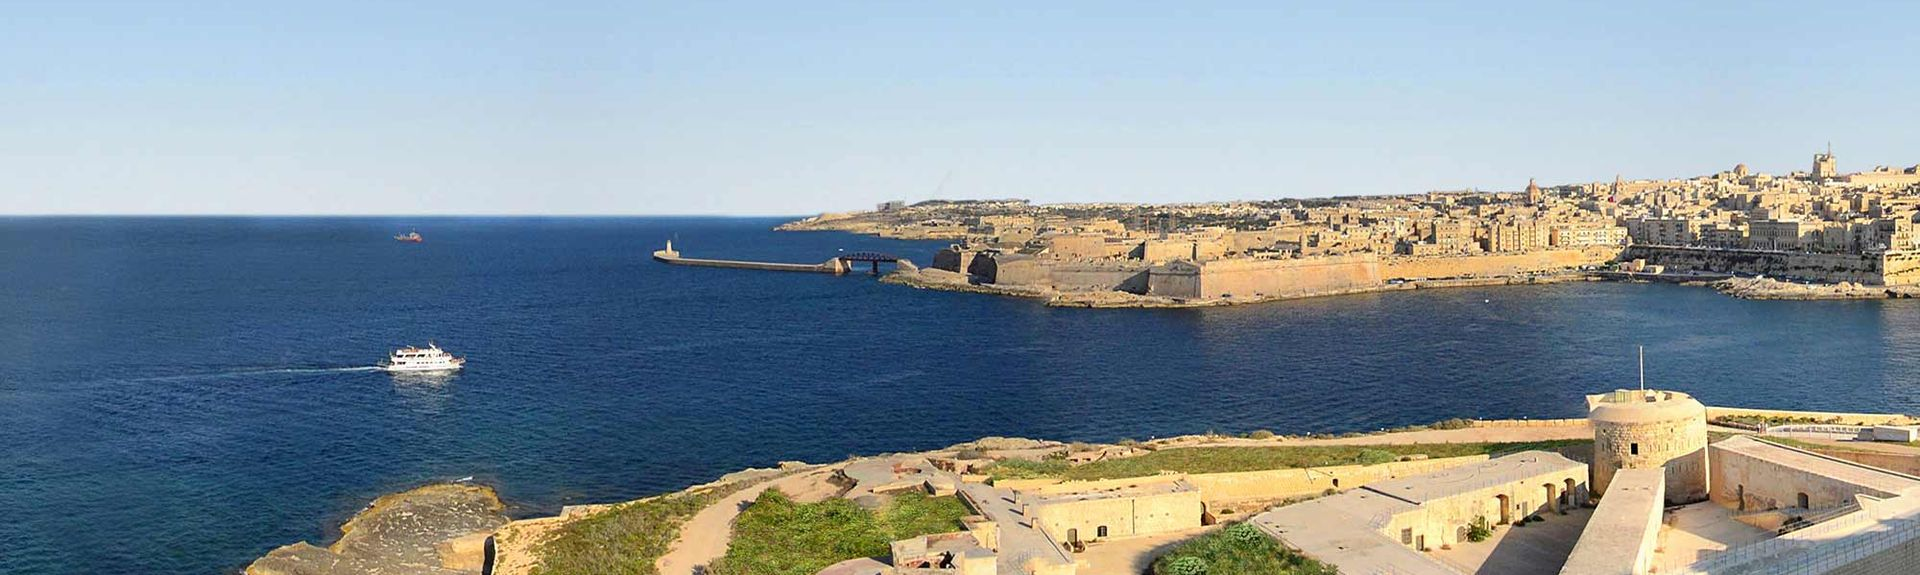 Il-Balluta, Saint Julian's, Malta